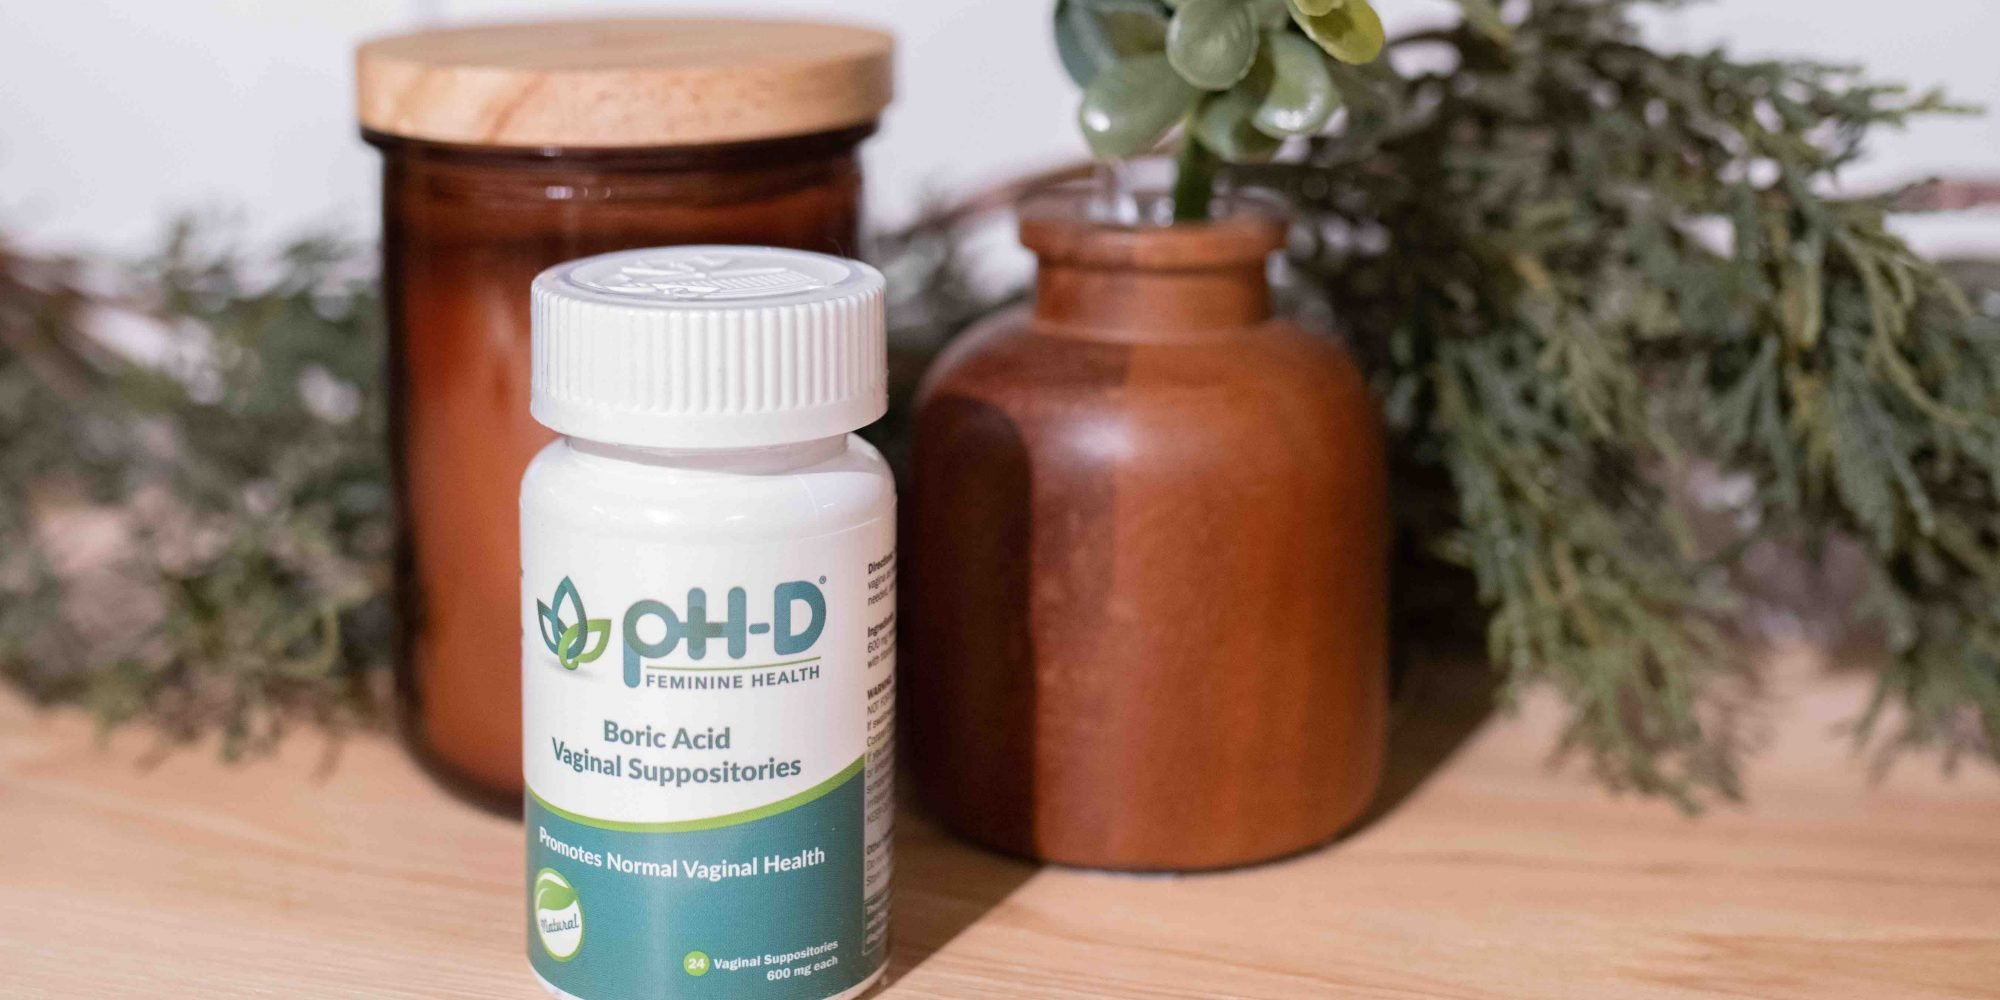 How pH-D Feminine Health Has Built A Big Business Addressing Vaginal Issues